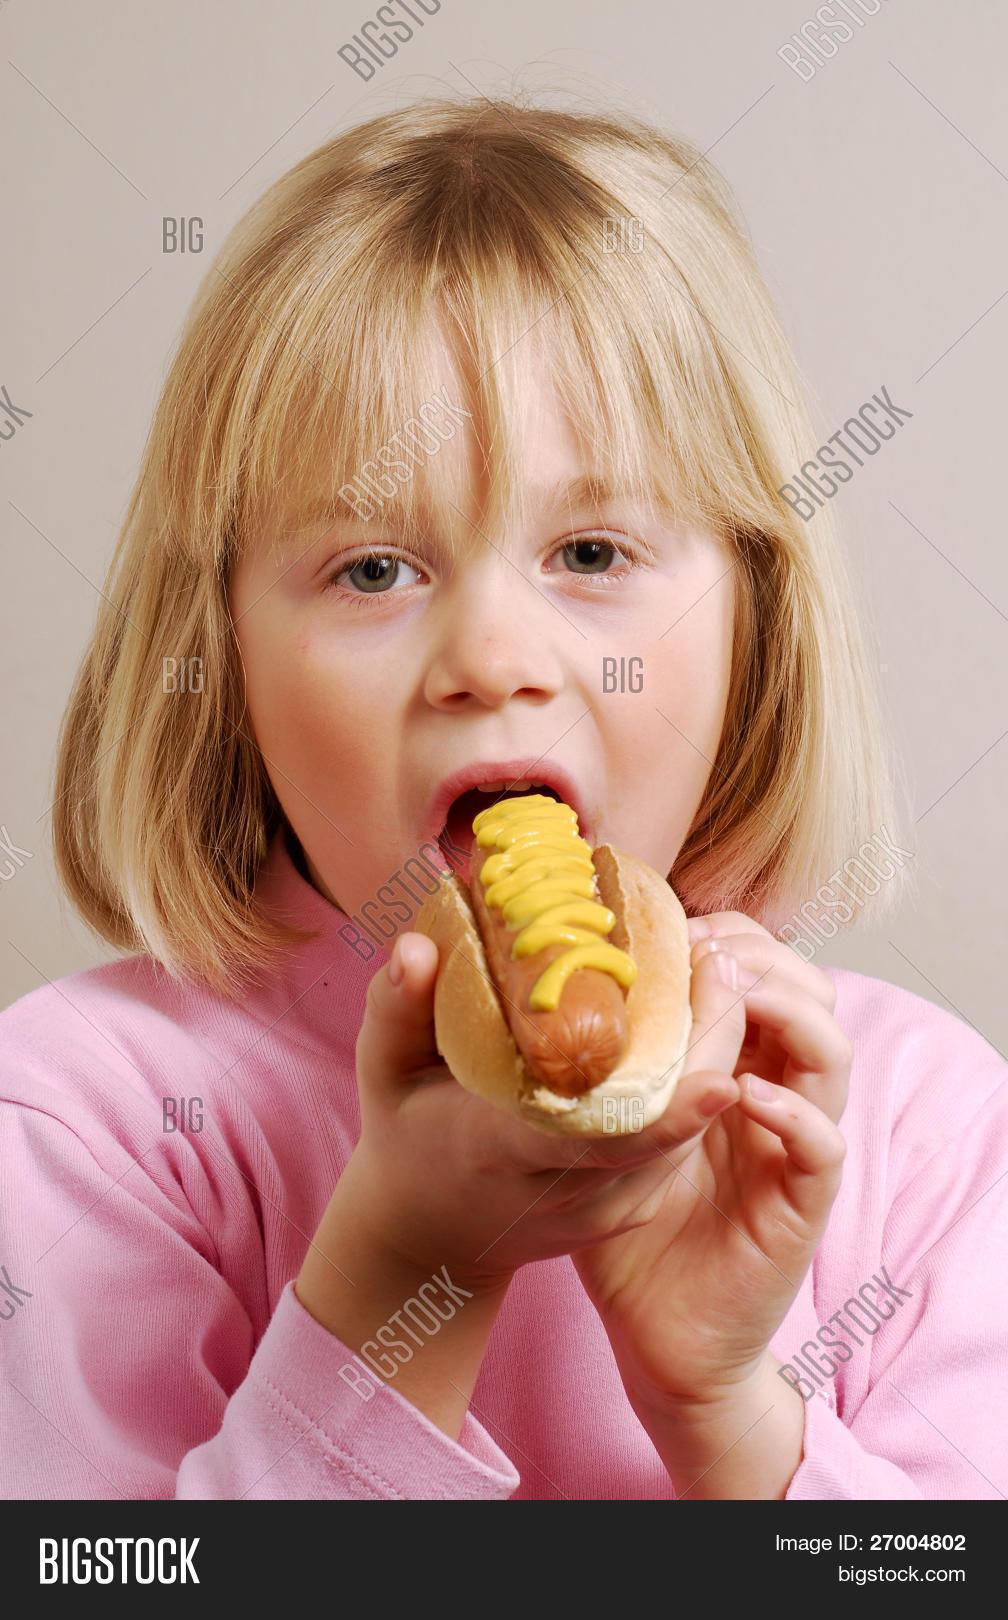 little girl hot photo